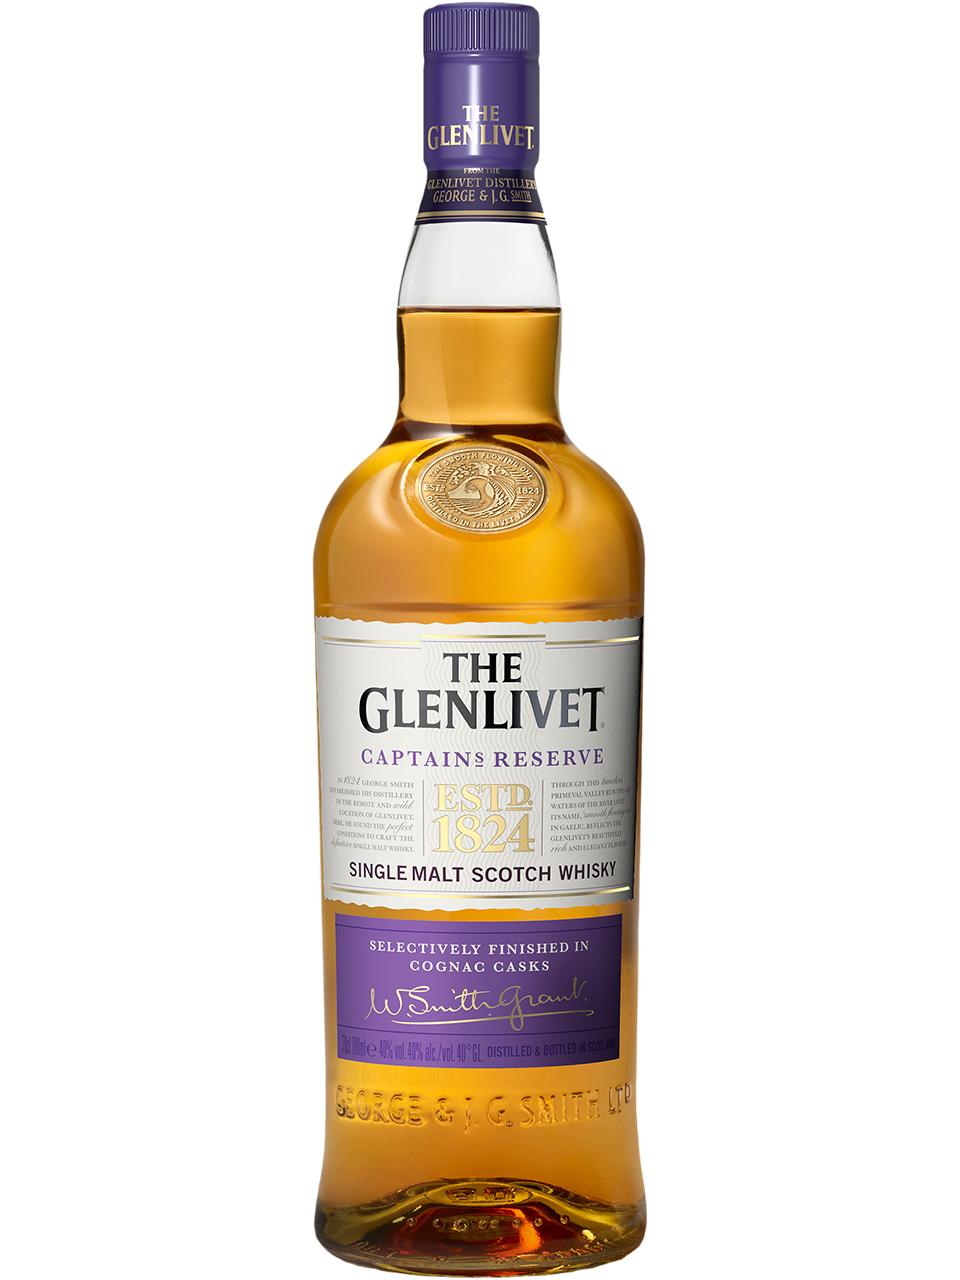 The Glenlivet Captain's Reserve Single Malt Scotch